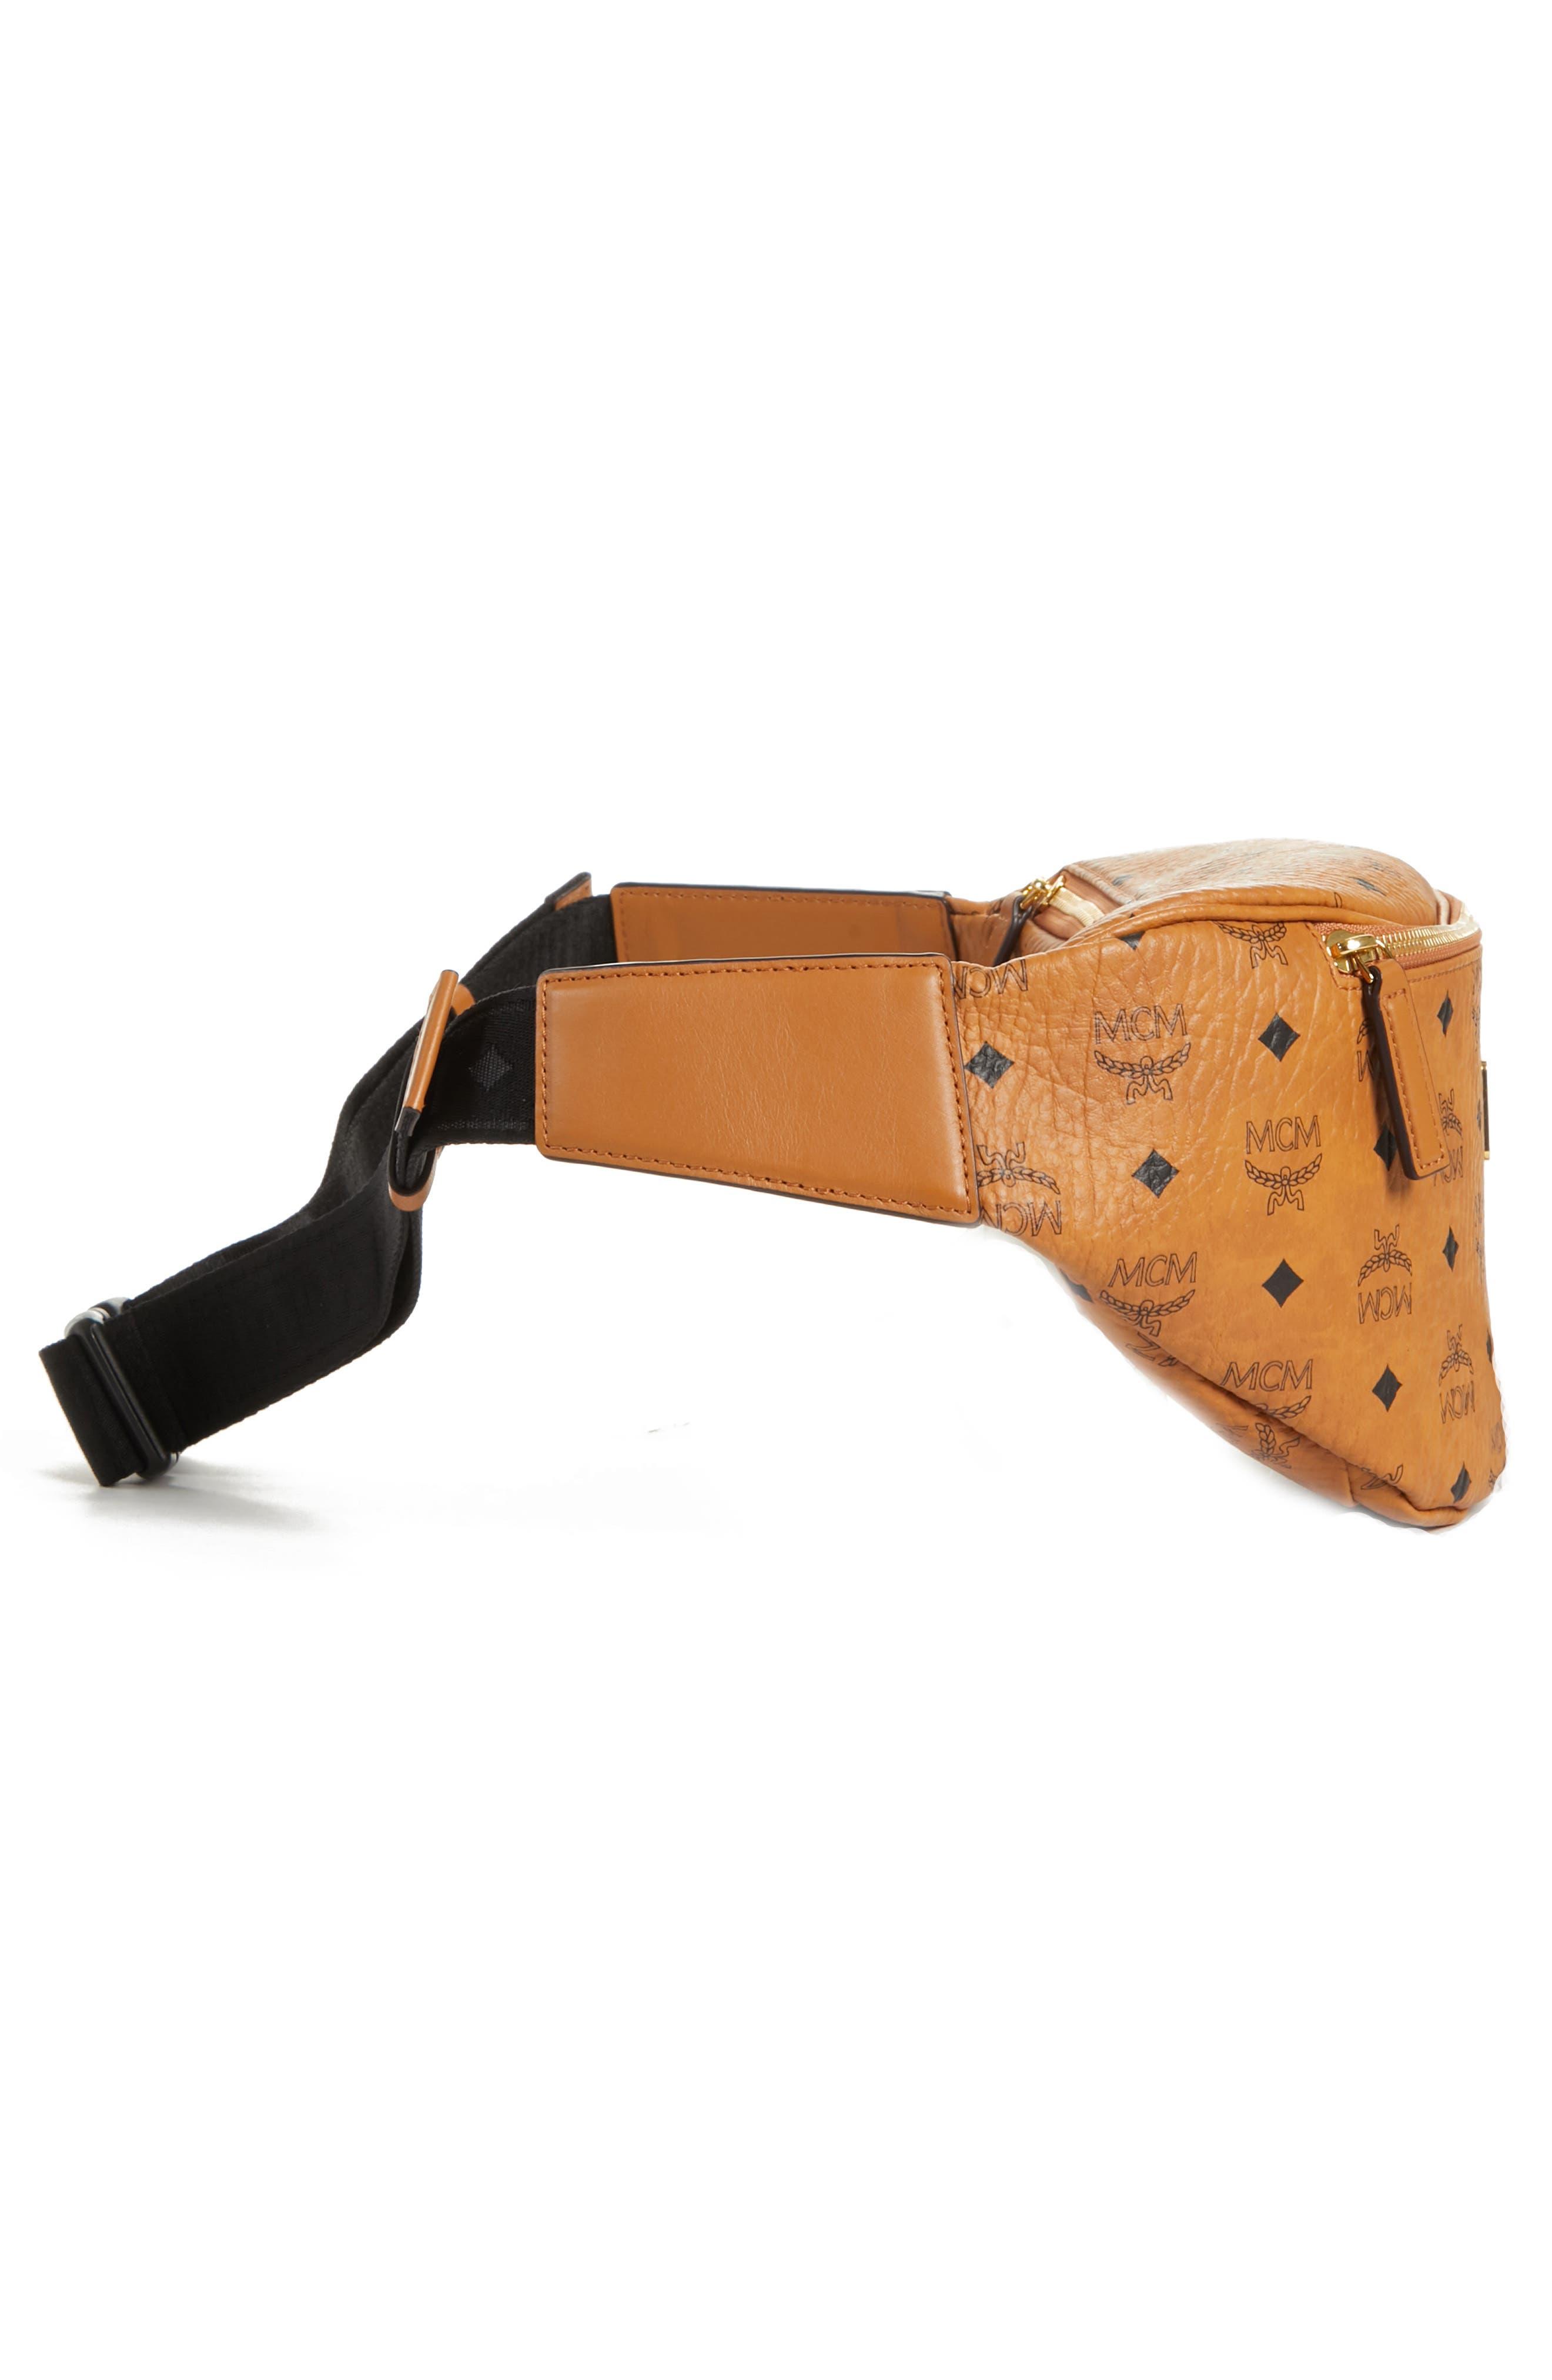 Medium Stark Belt Bag,                             Alternate thumbnail 4, color,                             Cognac Co